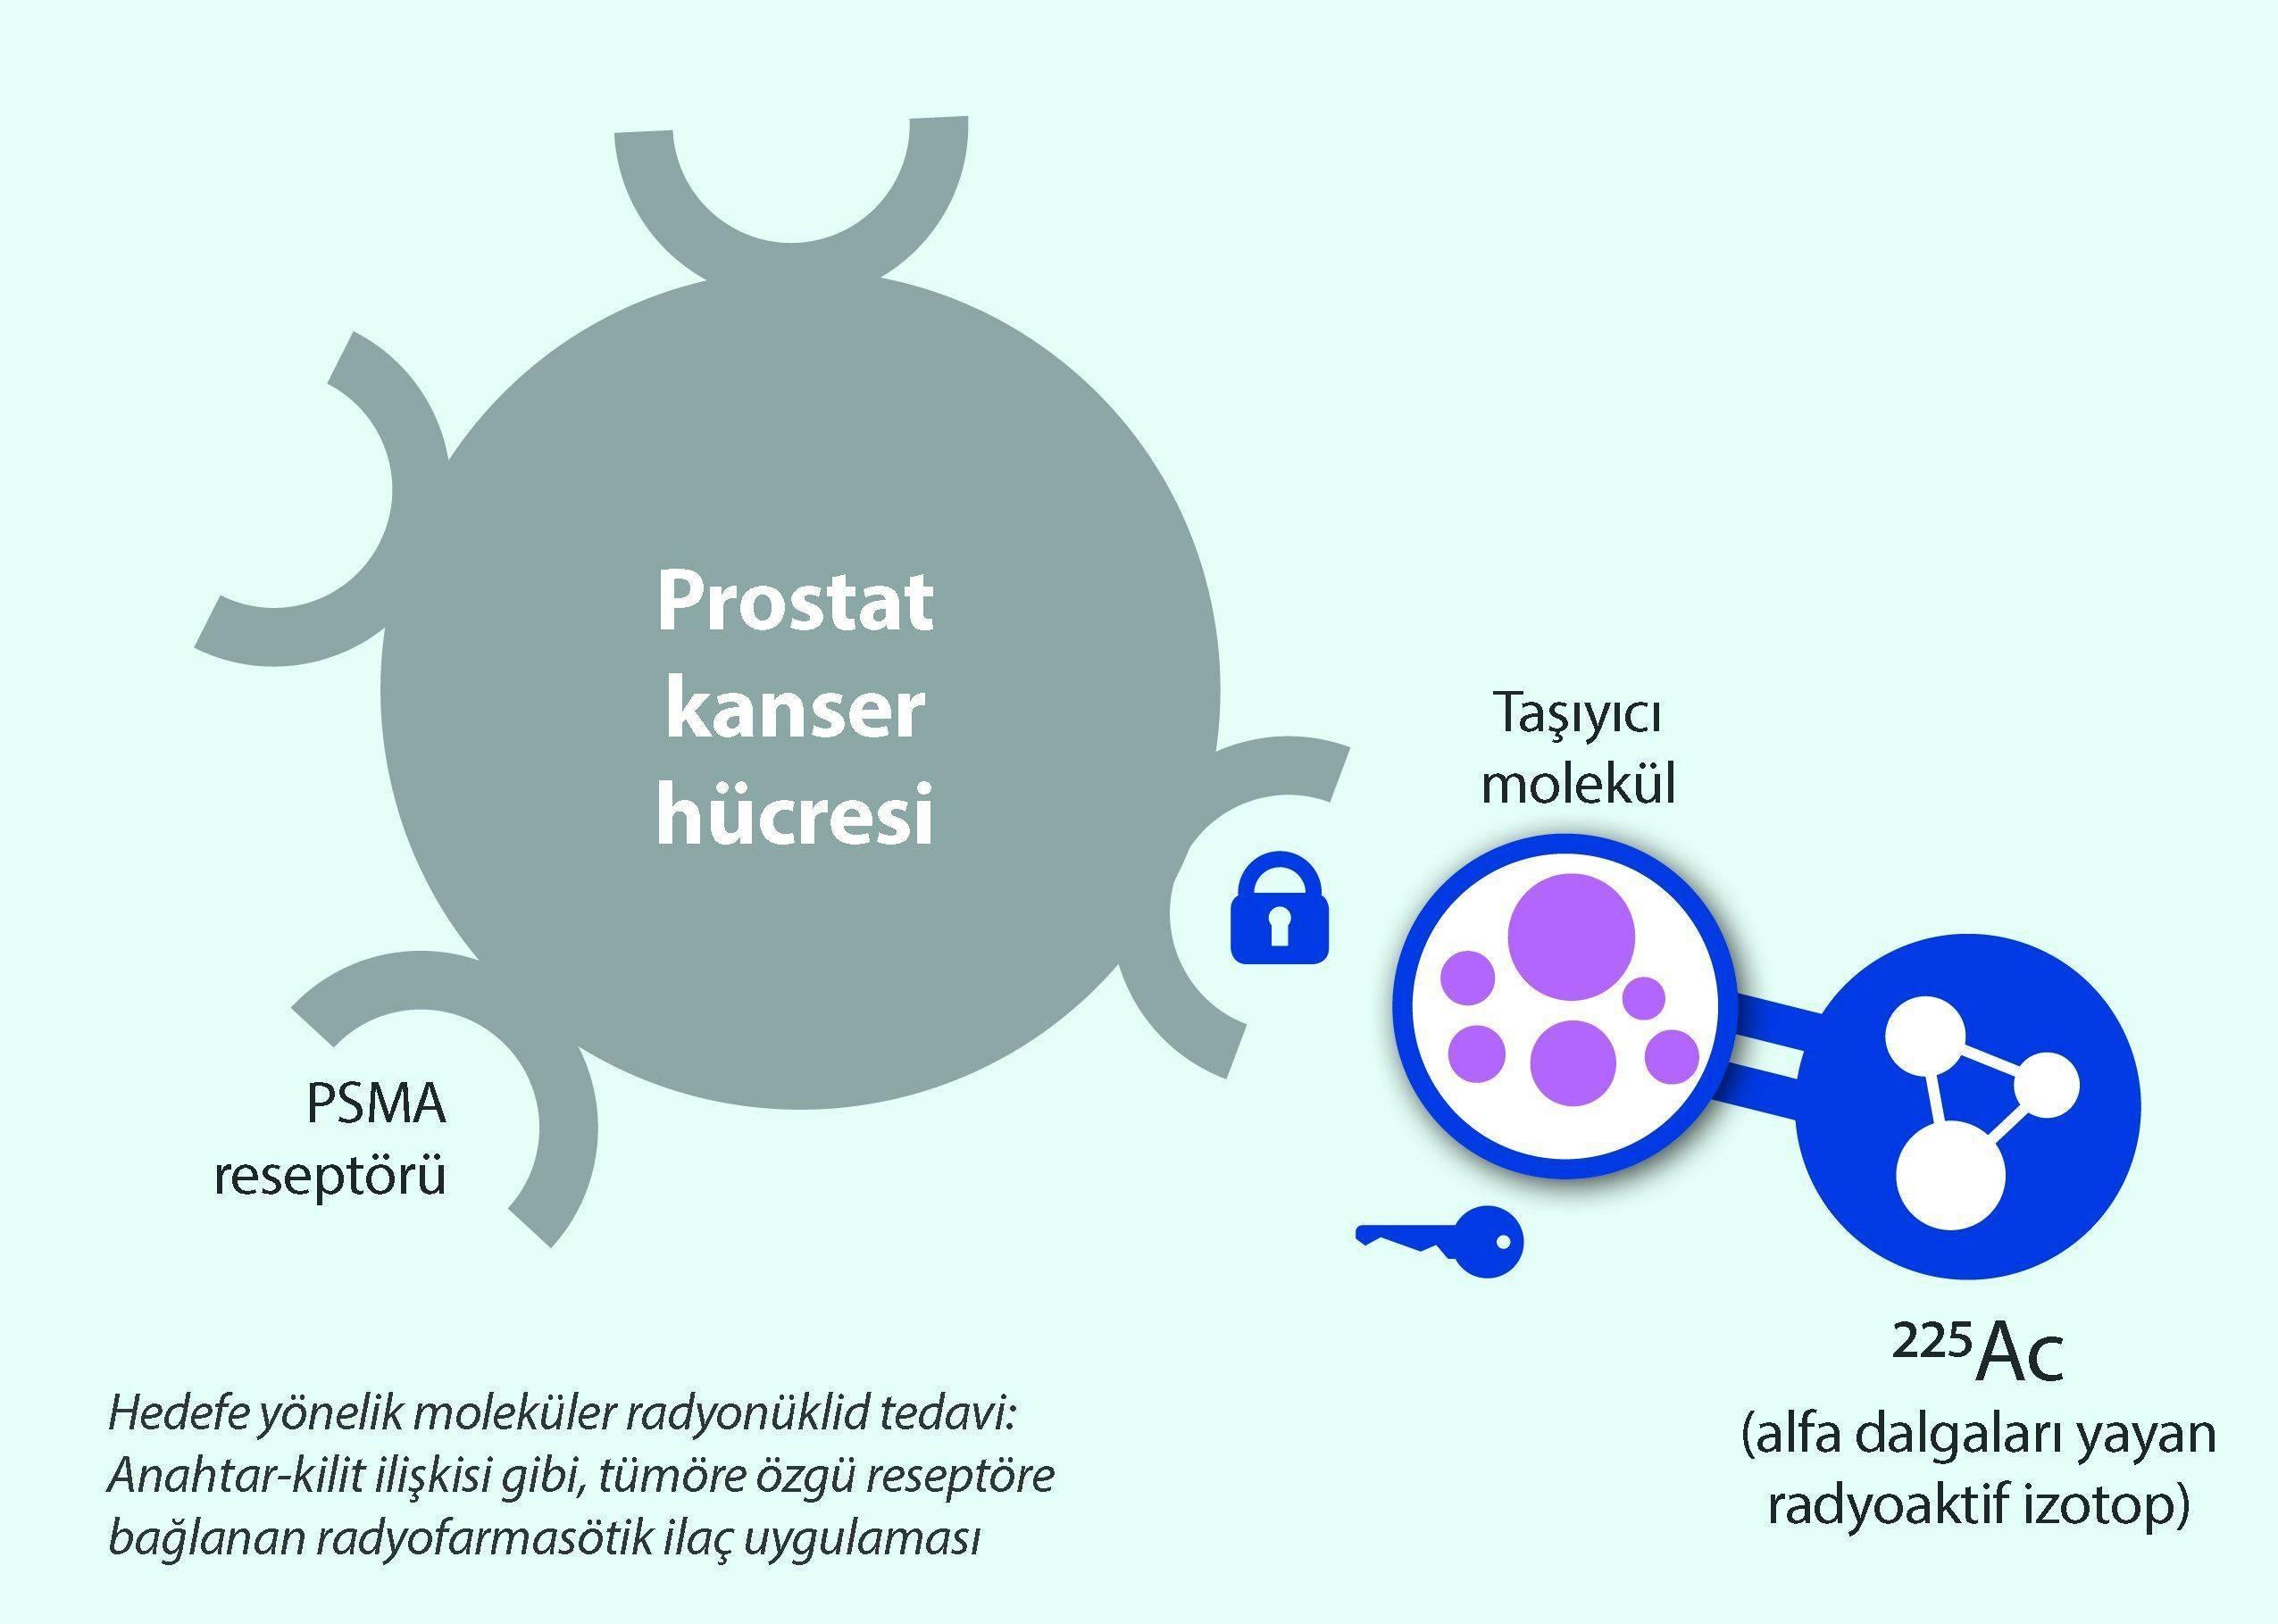 aktinyum alfa dalga tedavisi ac 225 ileri evre prostat kanseri